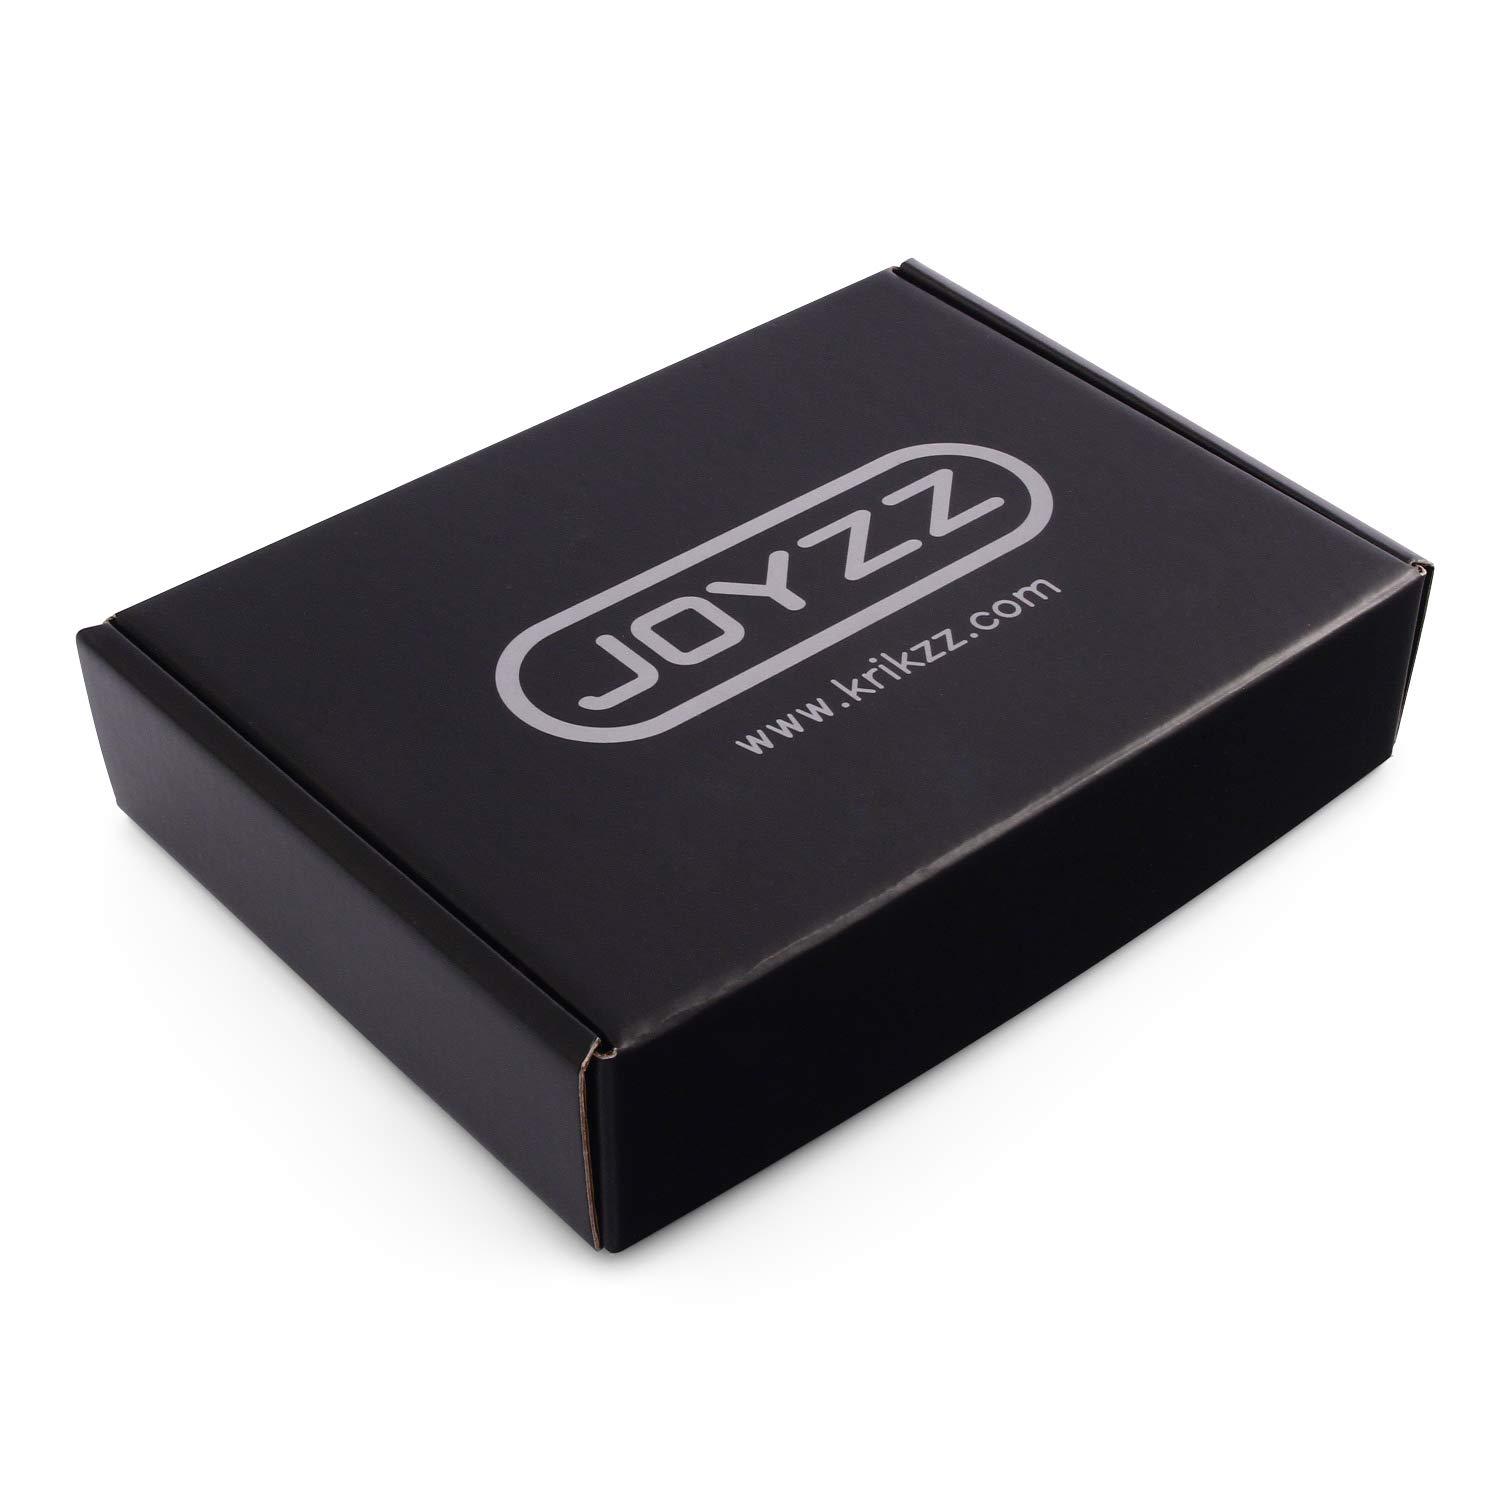 Joyzz Wireless Controller Gamepad for Original SEGA Genesis, Megadrive by Krikzz (Image #4)